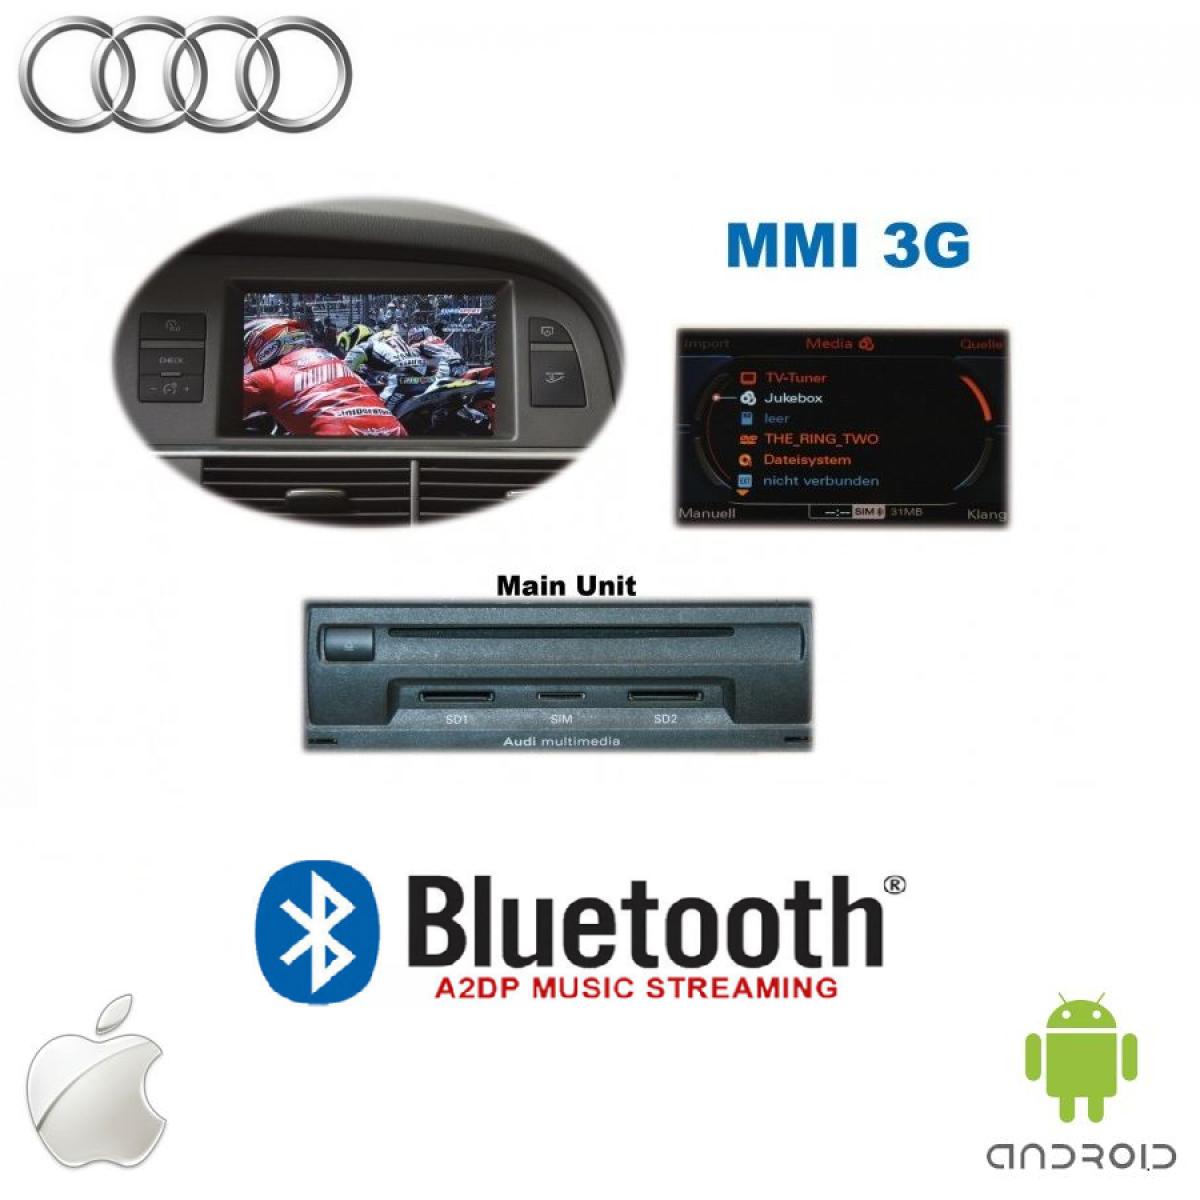 bluetooth adapter zum musik streaming f r audi mit mmi 3g. Black Bedroom Furniture Sets. Home Design Ideas